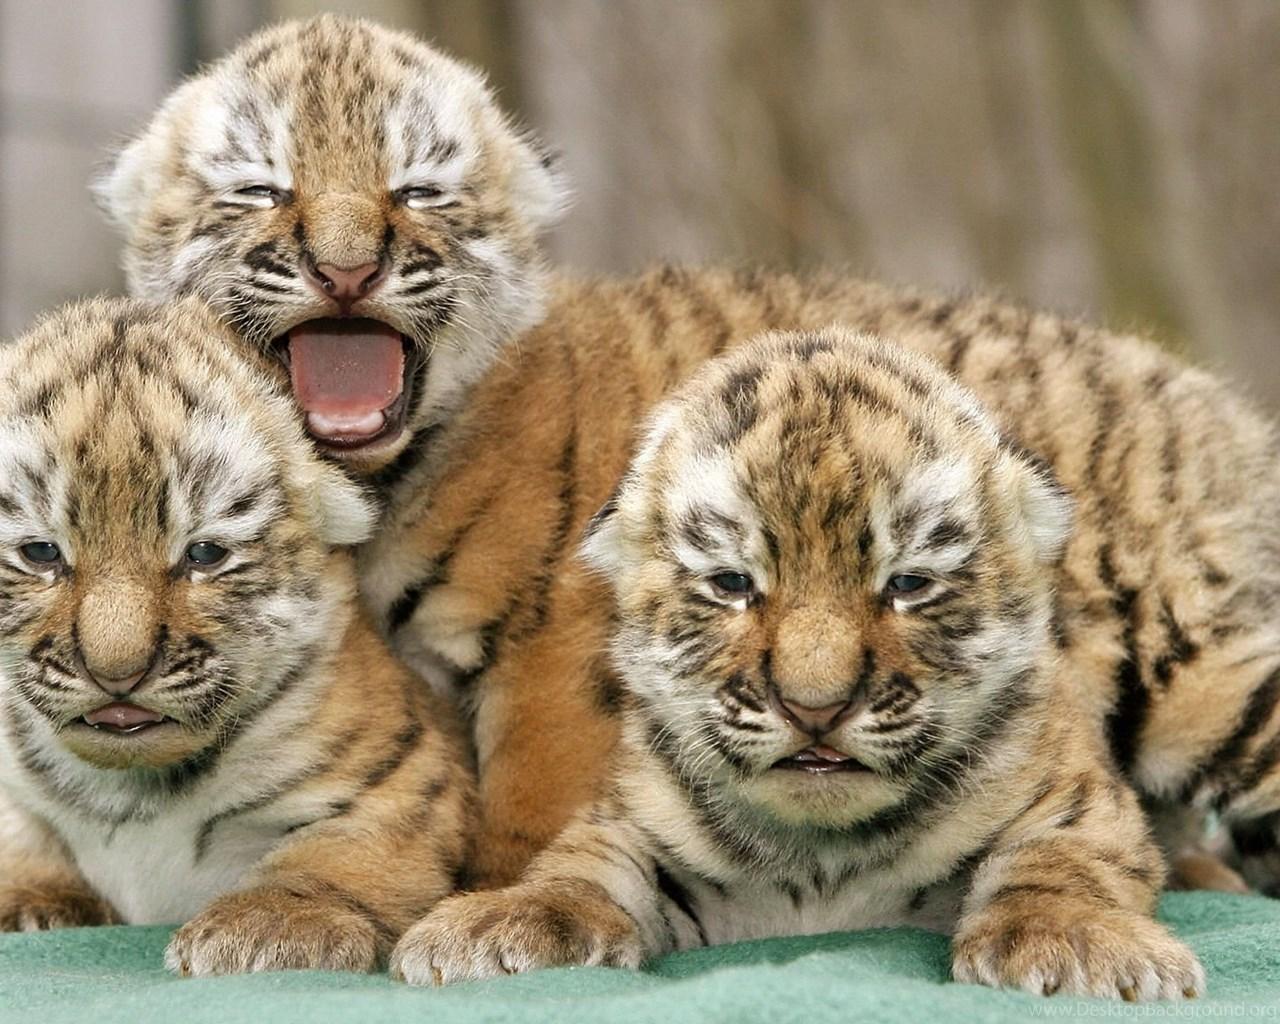 high definition tiger wallpapers for free download desktop background